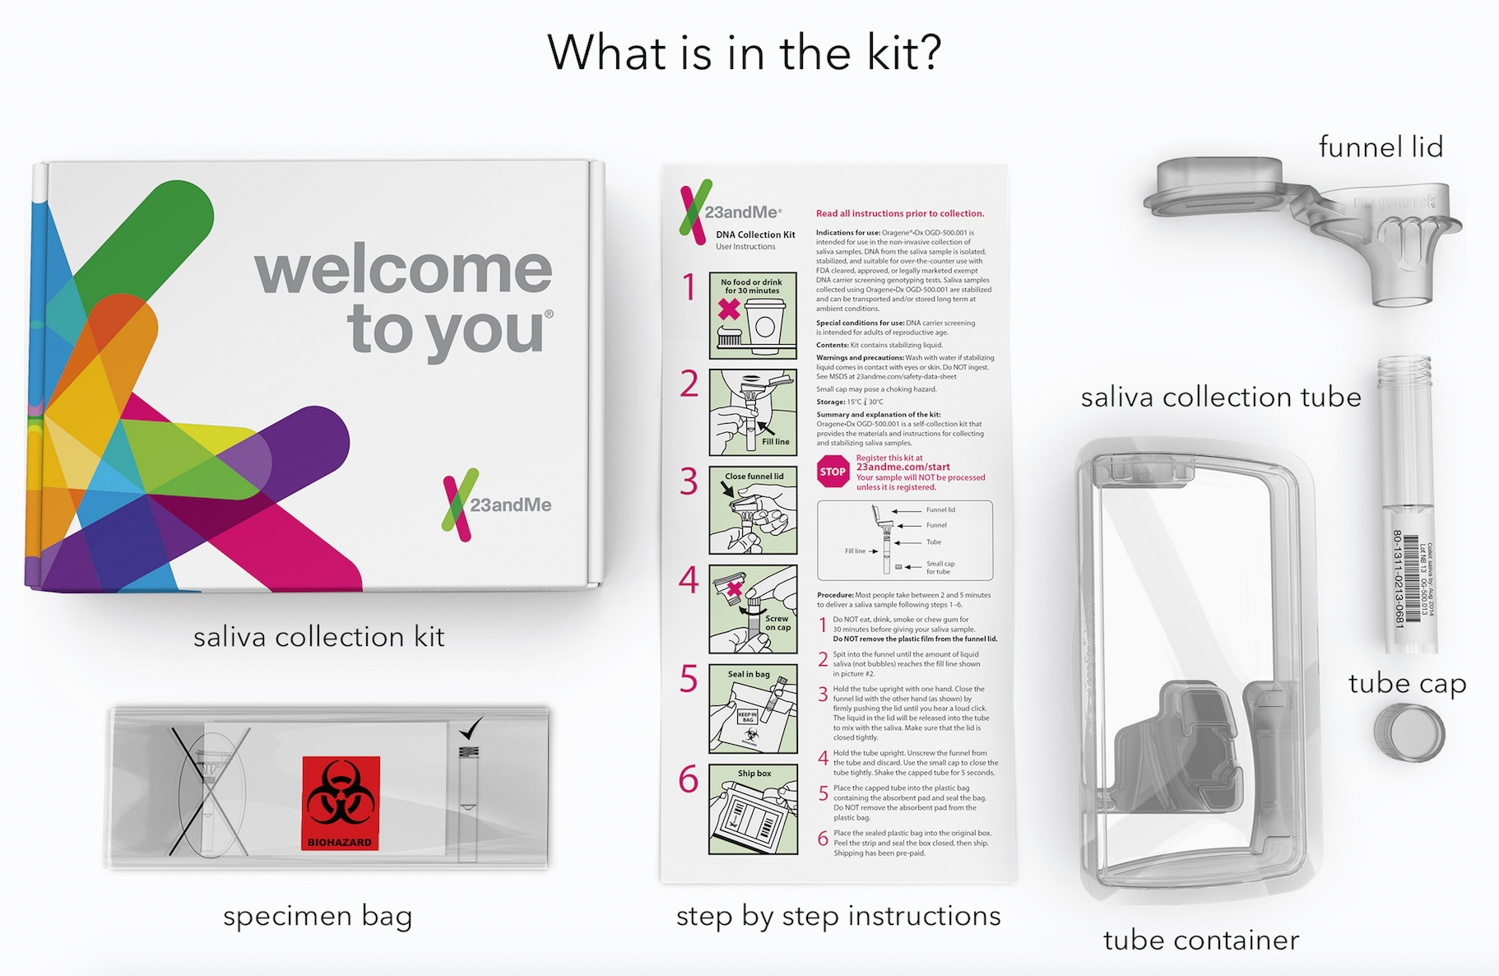 23andMe Kit Review